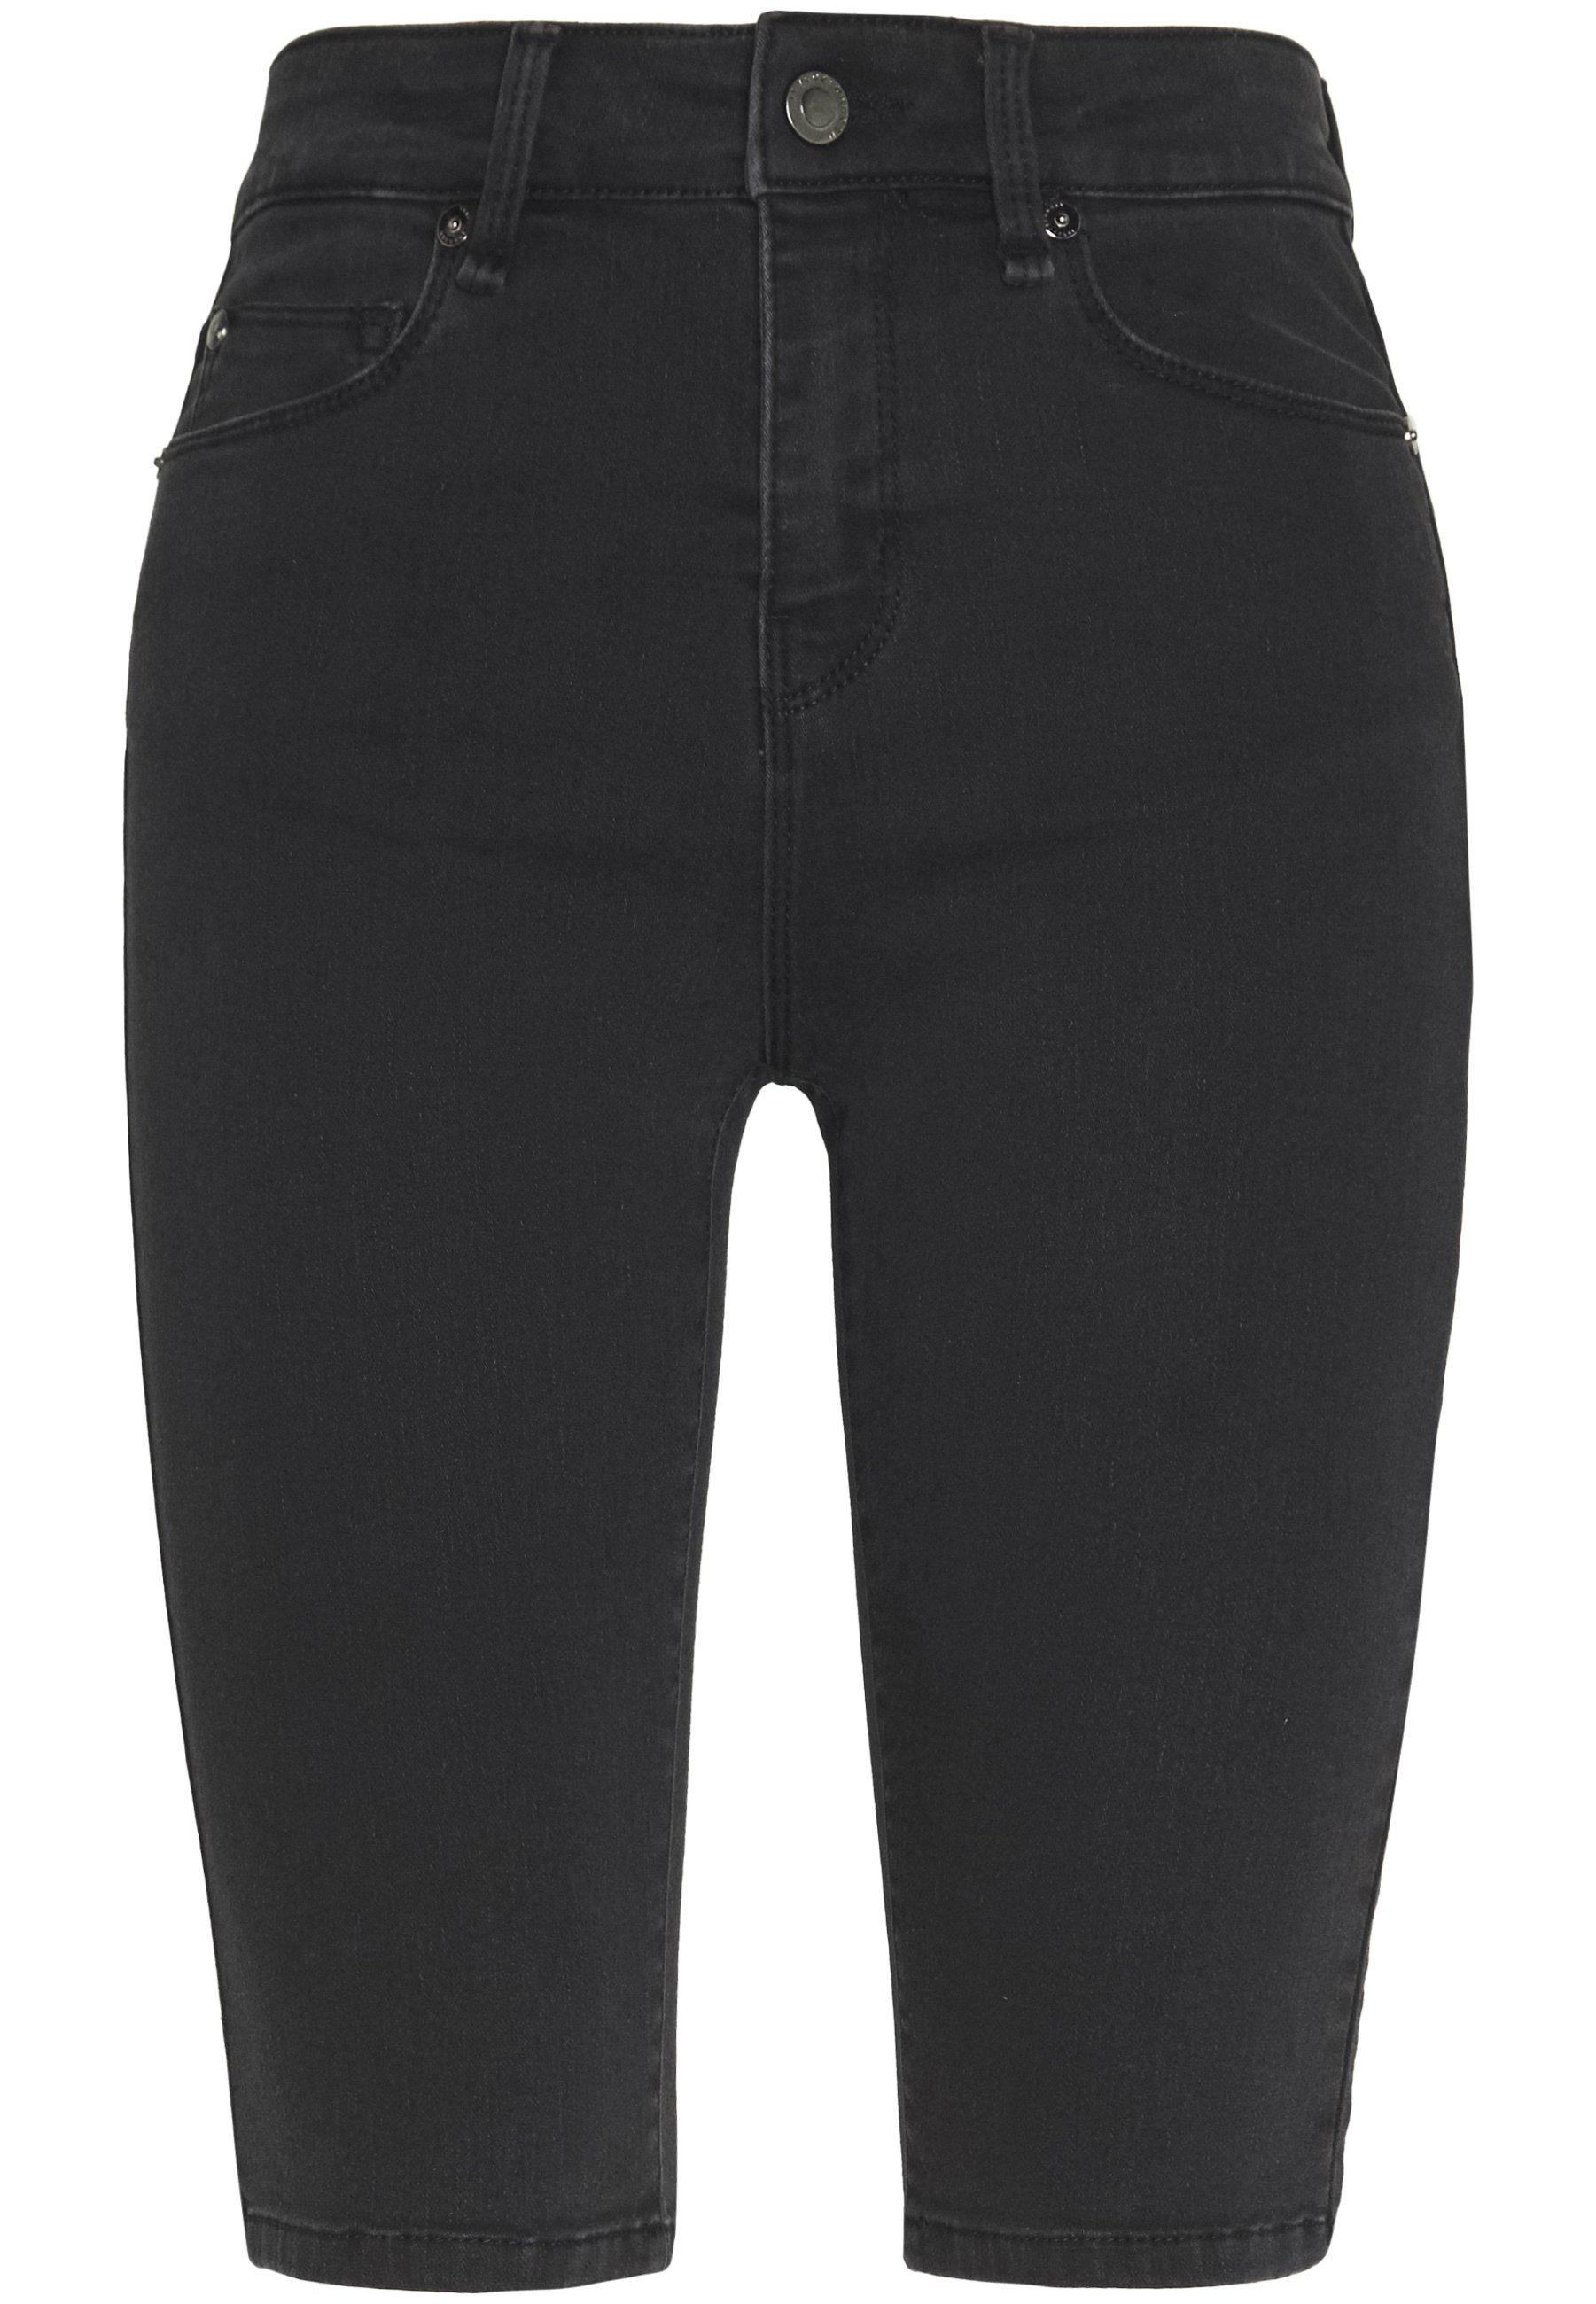 Ivy Copenhagen Alexa Knickers Wash - Jeans Shorts Cool Black 3erKQhPA O2